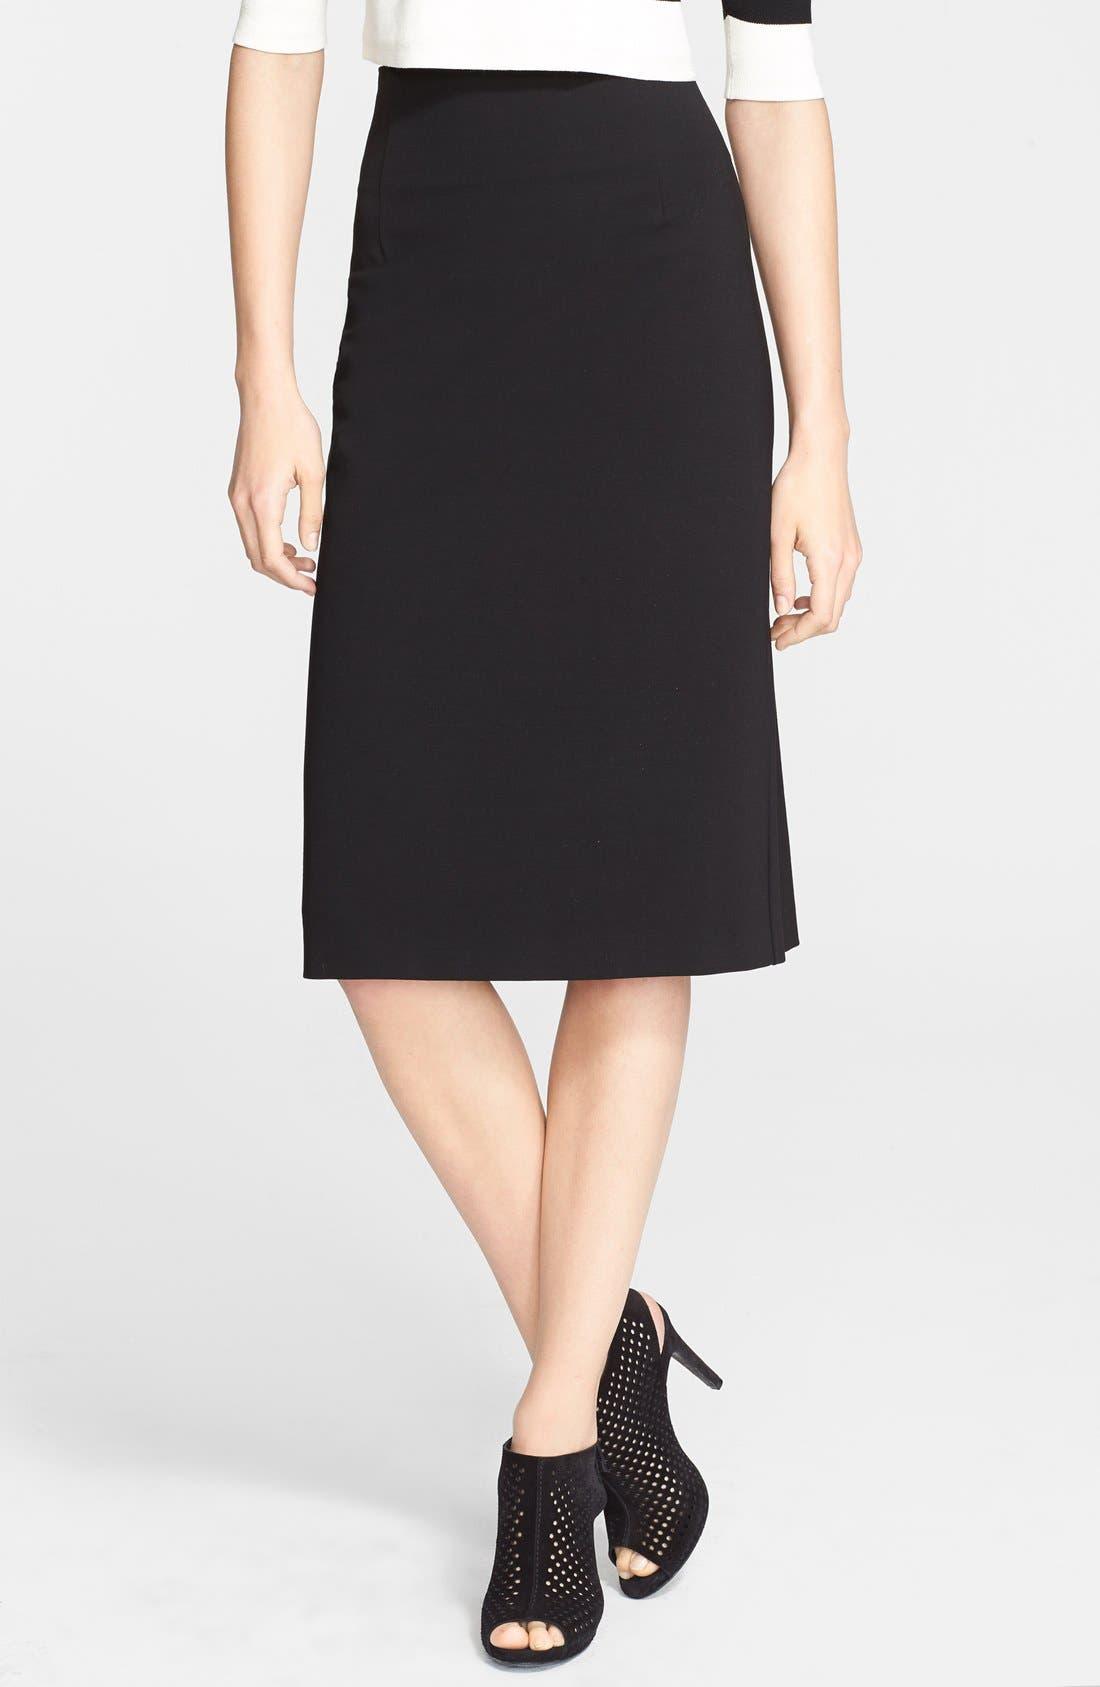 Main Image - Theory 'Austell' Pencil Skirt